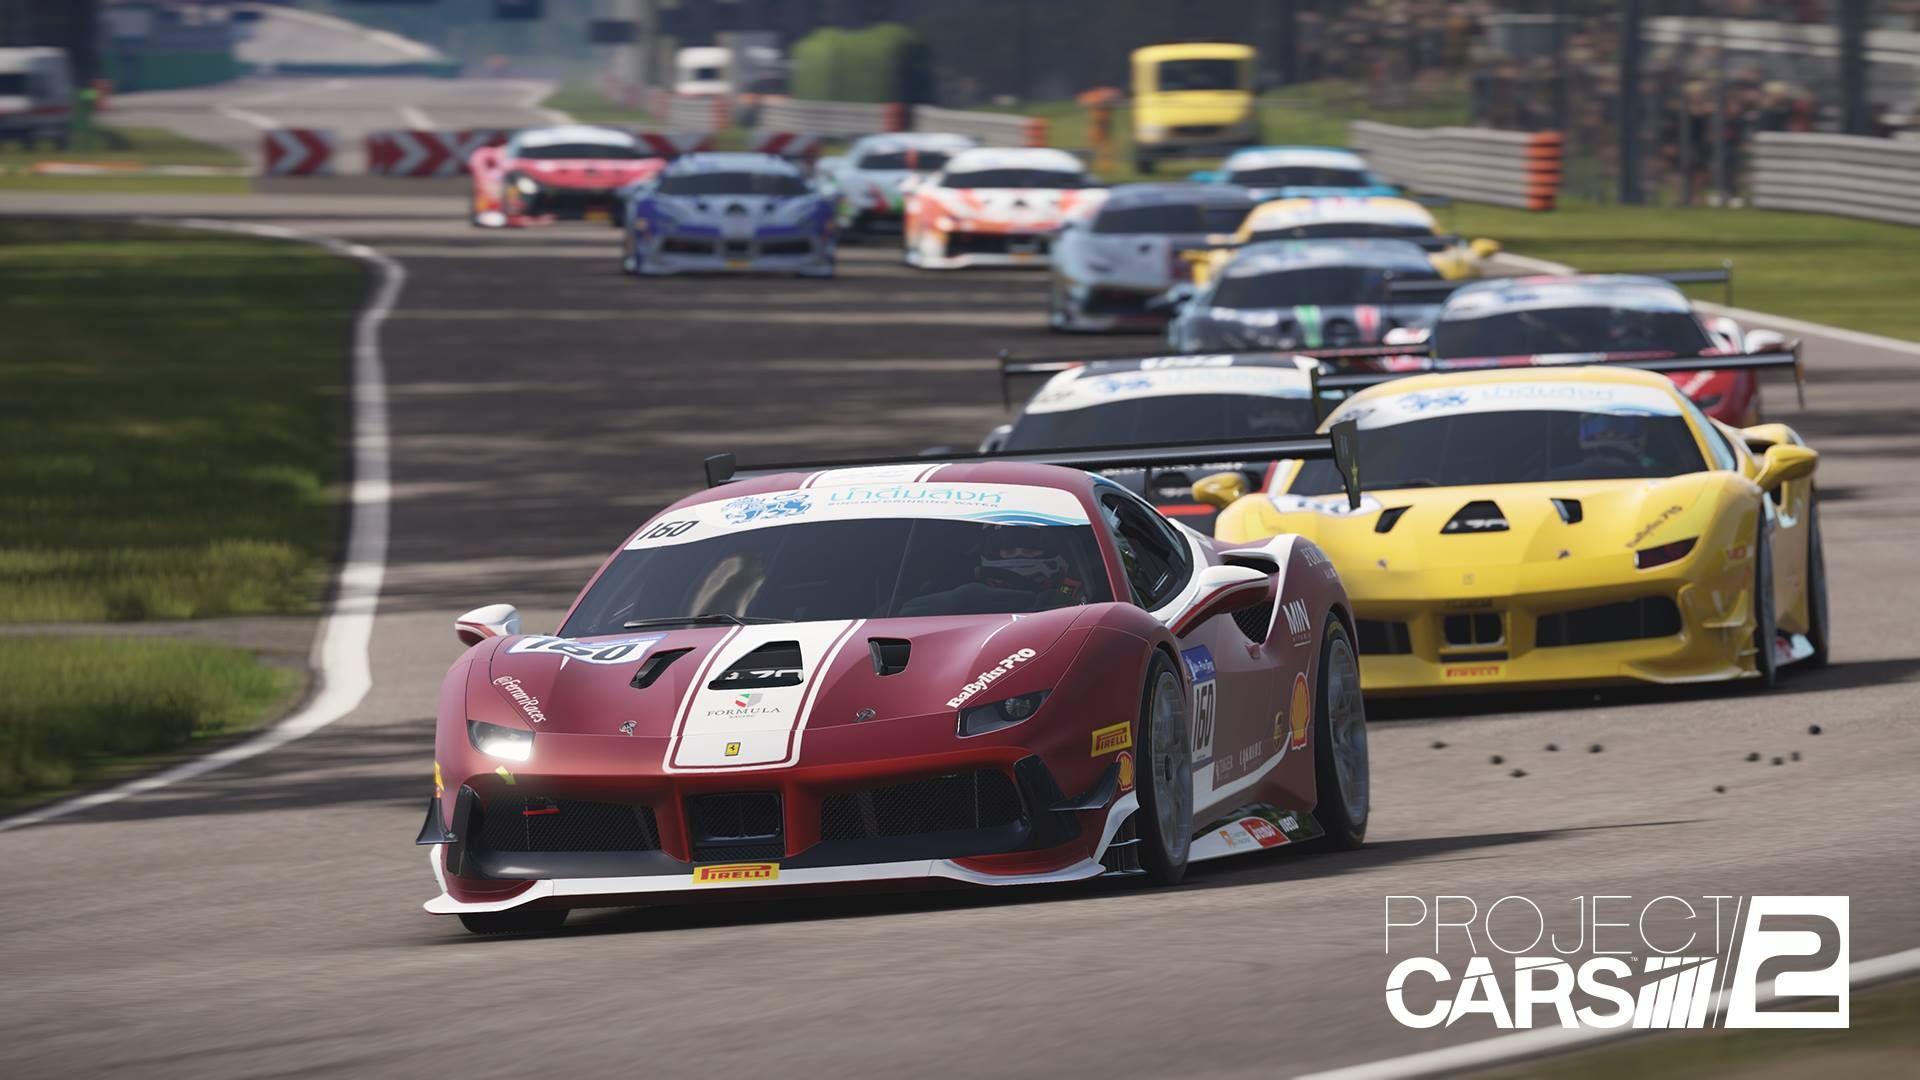 Project CARS 2 - Update 1 5 0 0 Deployed incl Ferrari 488